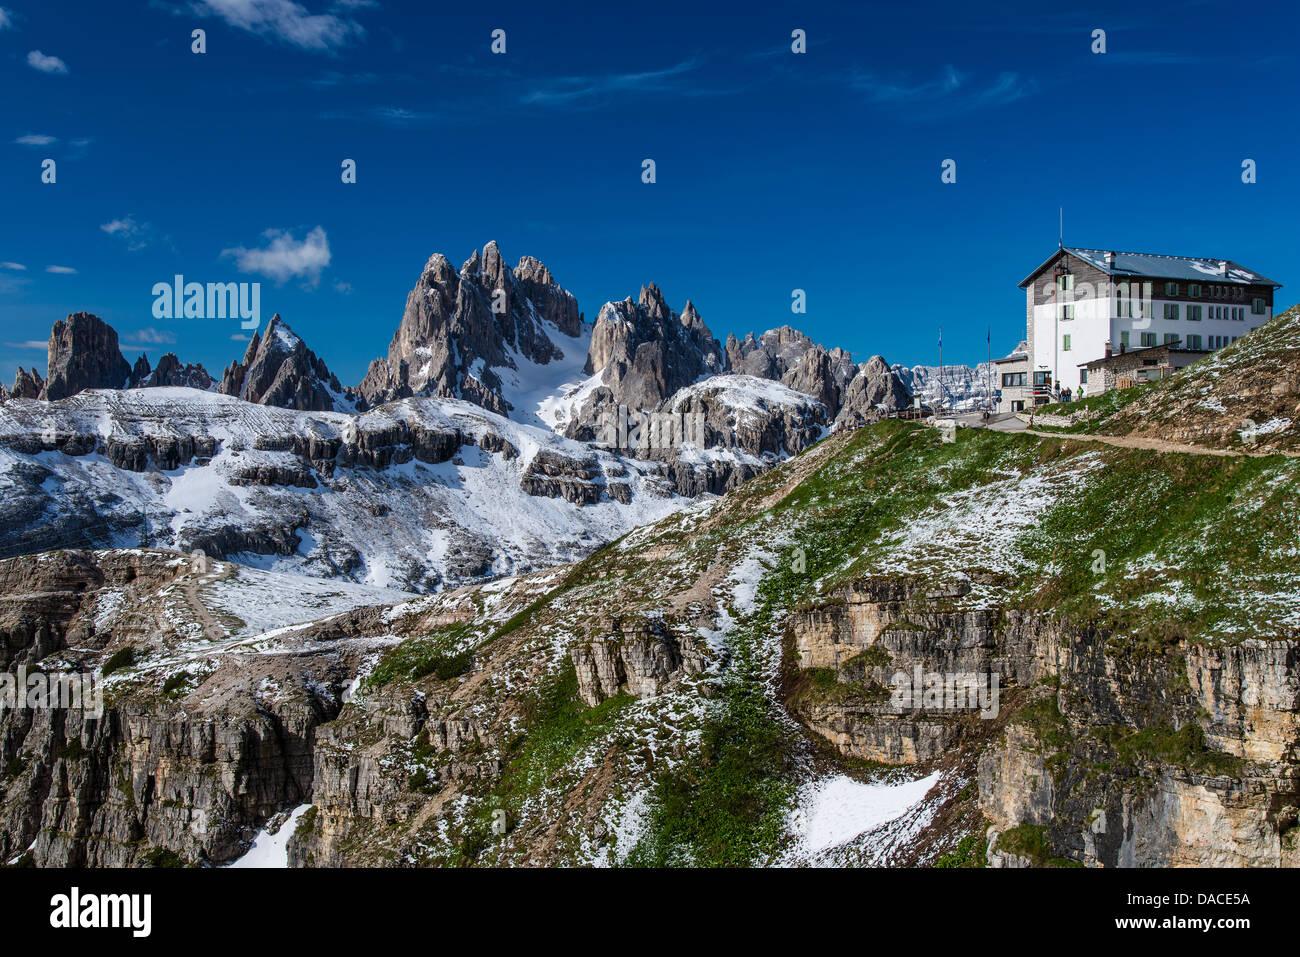 panoramablick ber die berggruppe sorapis und rifugio auronzo h tte dolomiten veneto italien. Black Bedroom Furniture Sets. Home Design Ideas